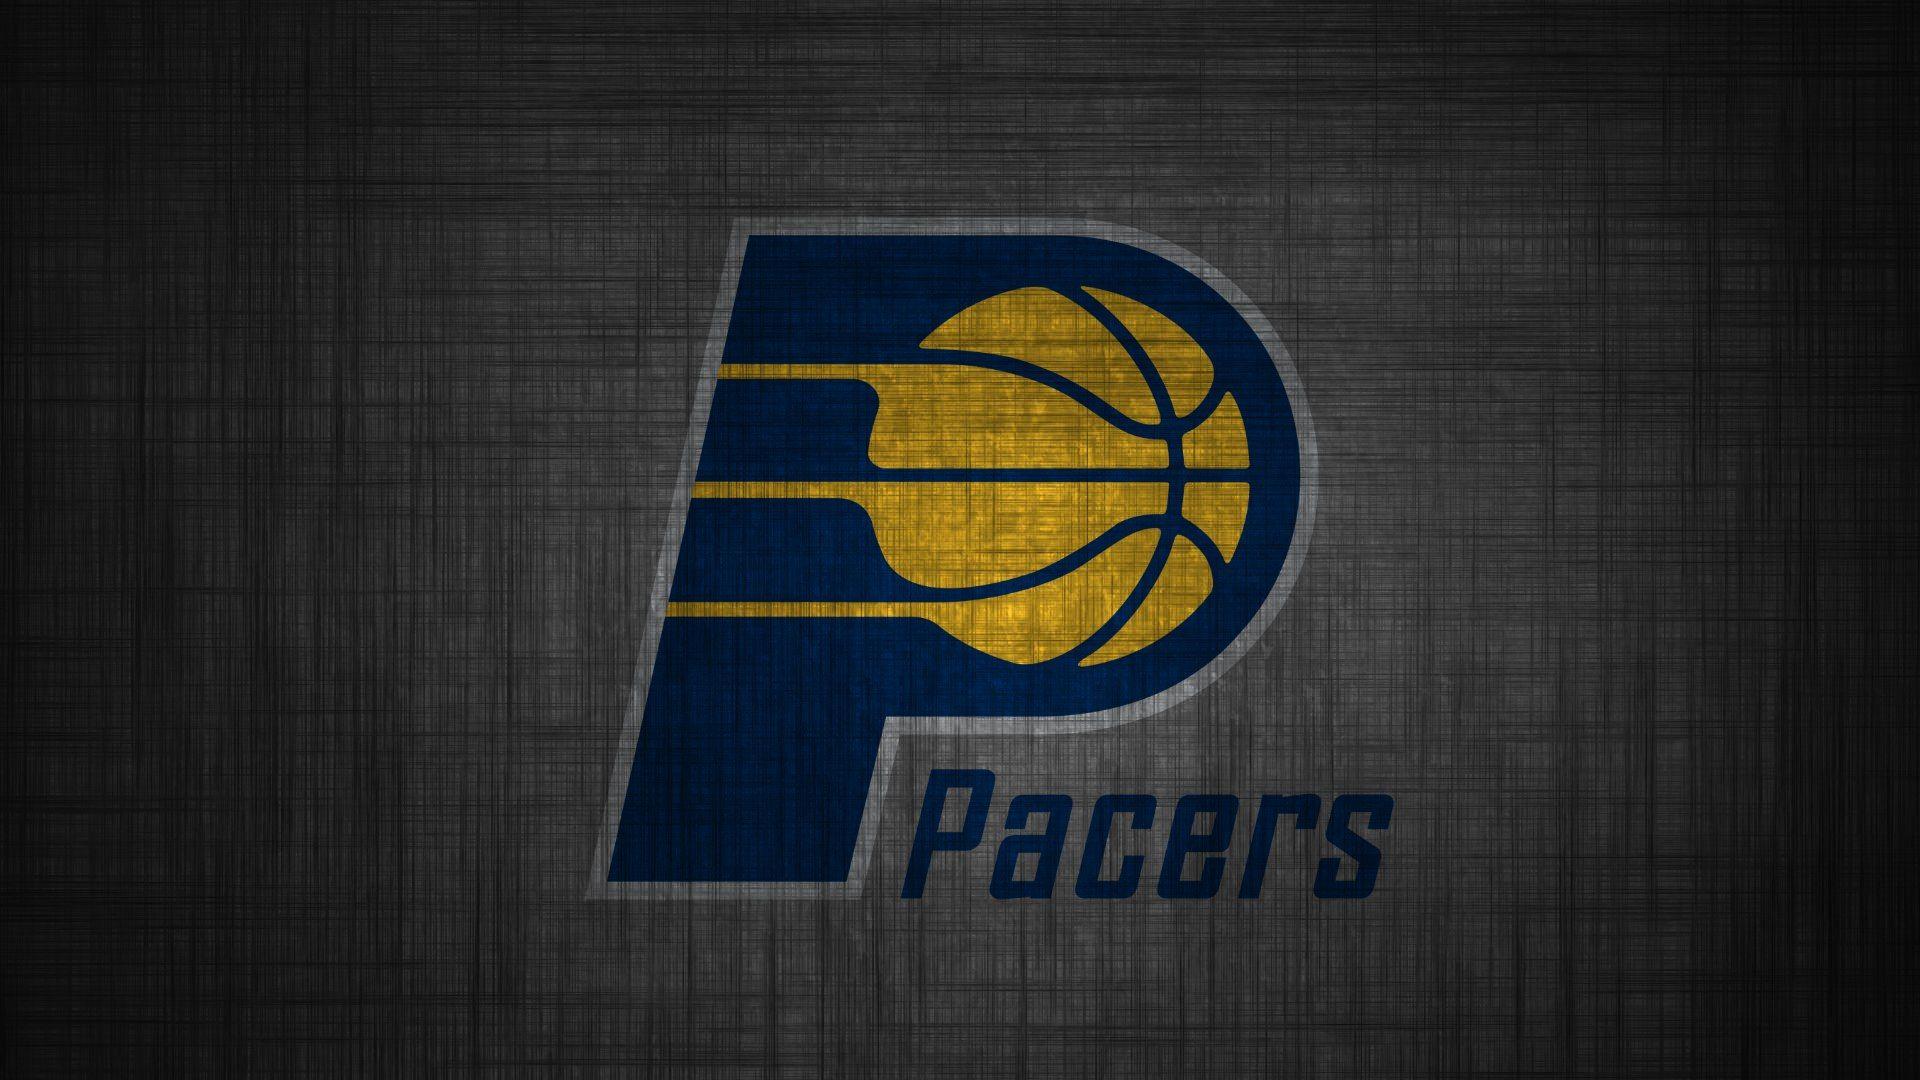 Indiana Pacers Logo Wallpaper Hd Wallpapers 1080p Basketball Wallpaper Basketball Wallpapers Hd Logo Wallpaper Hd